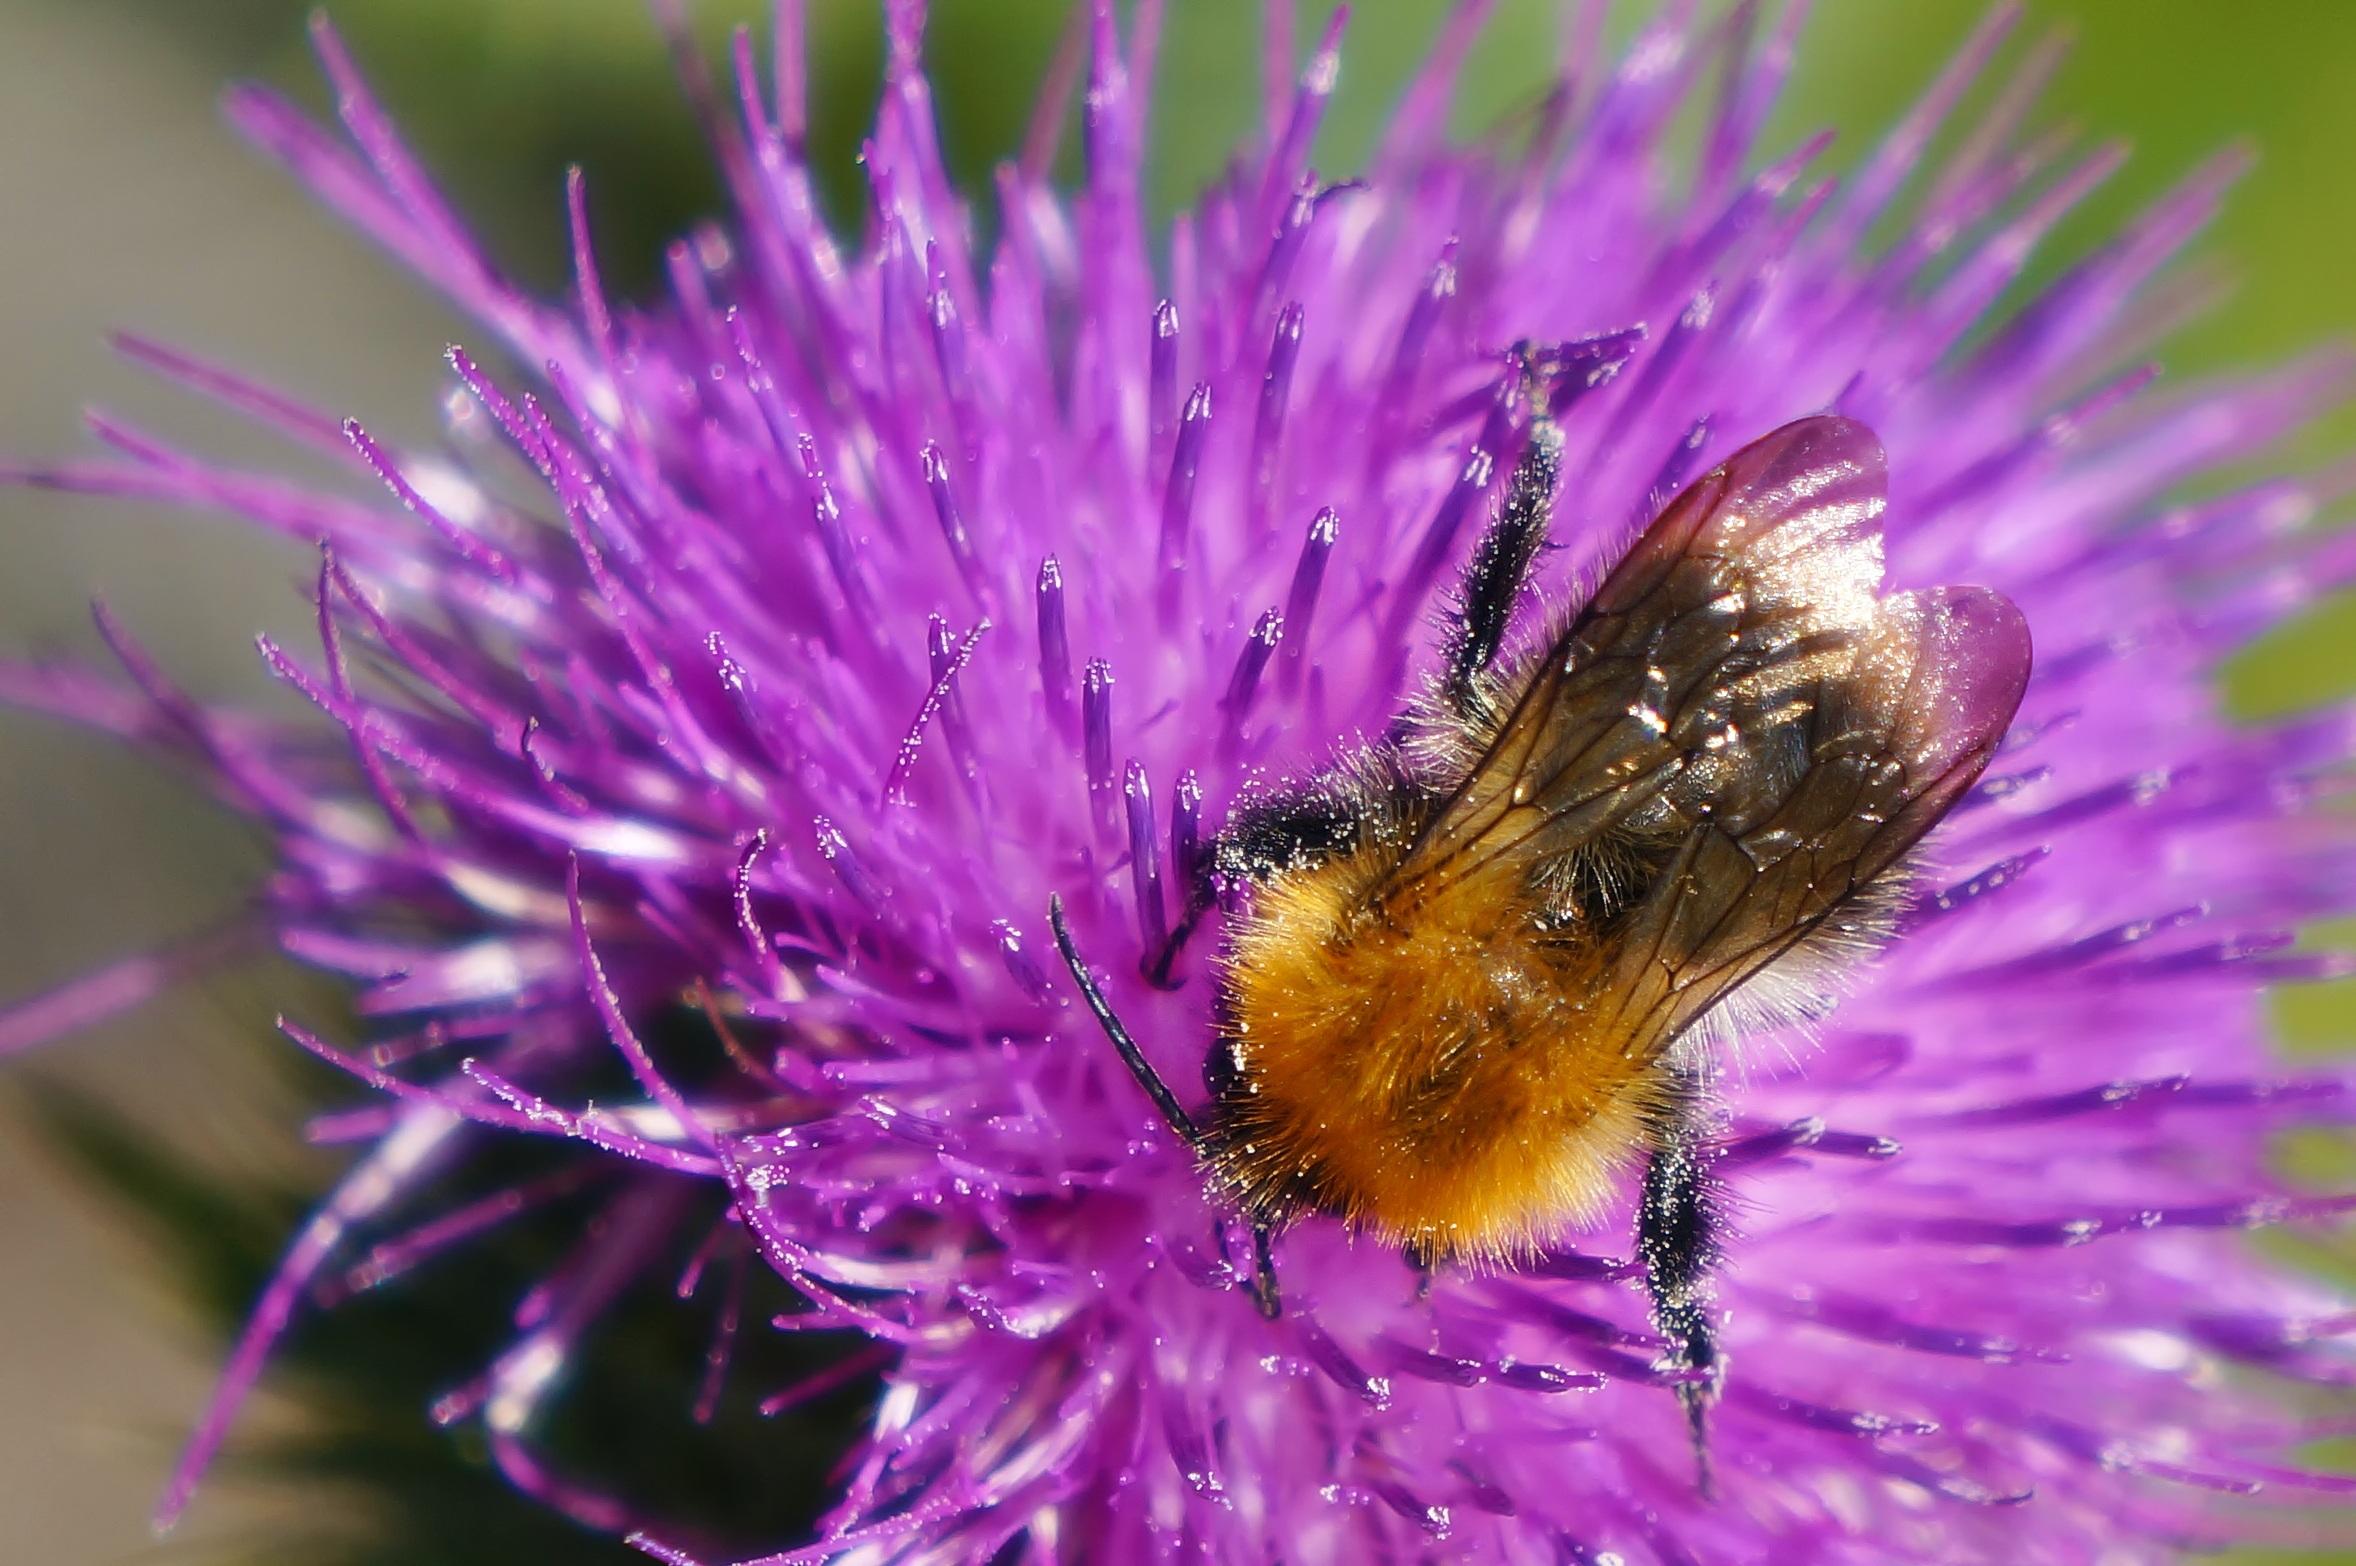 kostenlose foto natur draussen bl hen fotografie blume lila bl tenblatt sommer pollen. Black Bedroom Furniture Sets. Home Design Ideas